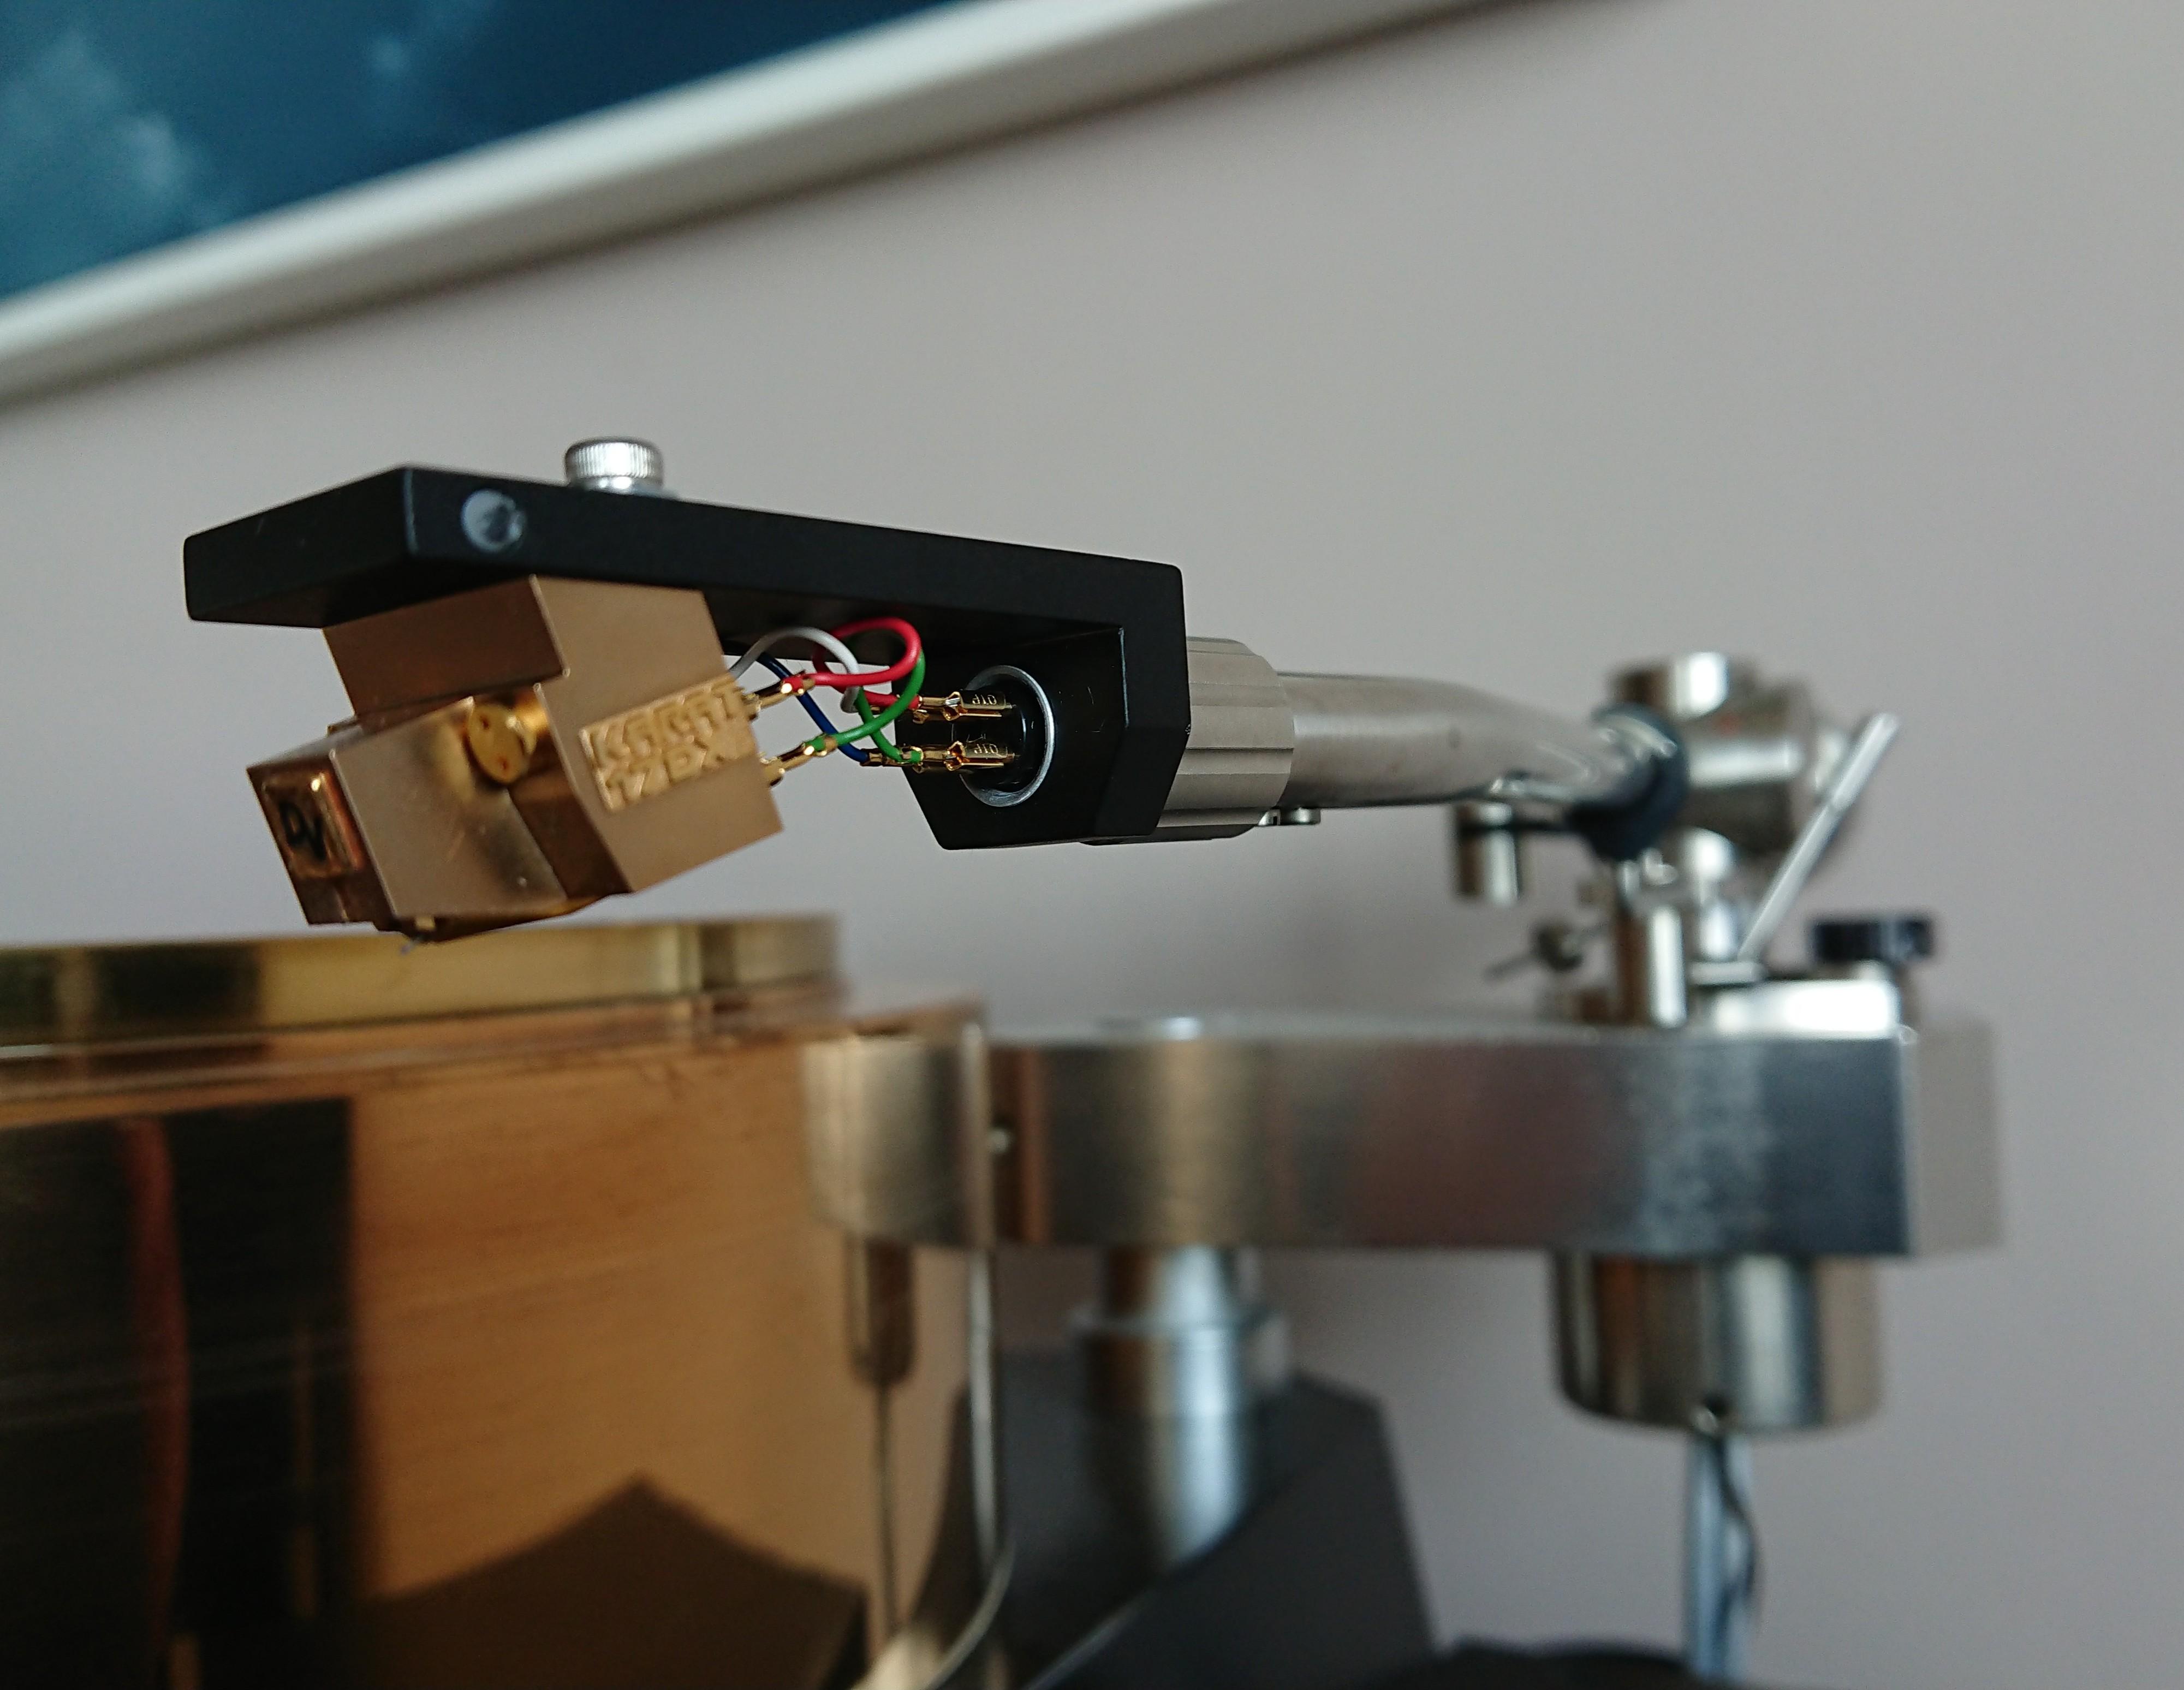 Choosing the right cartridge